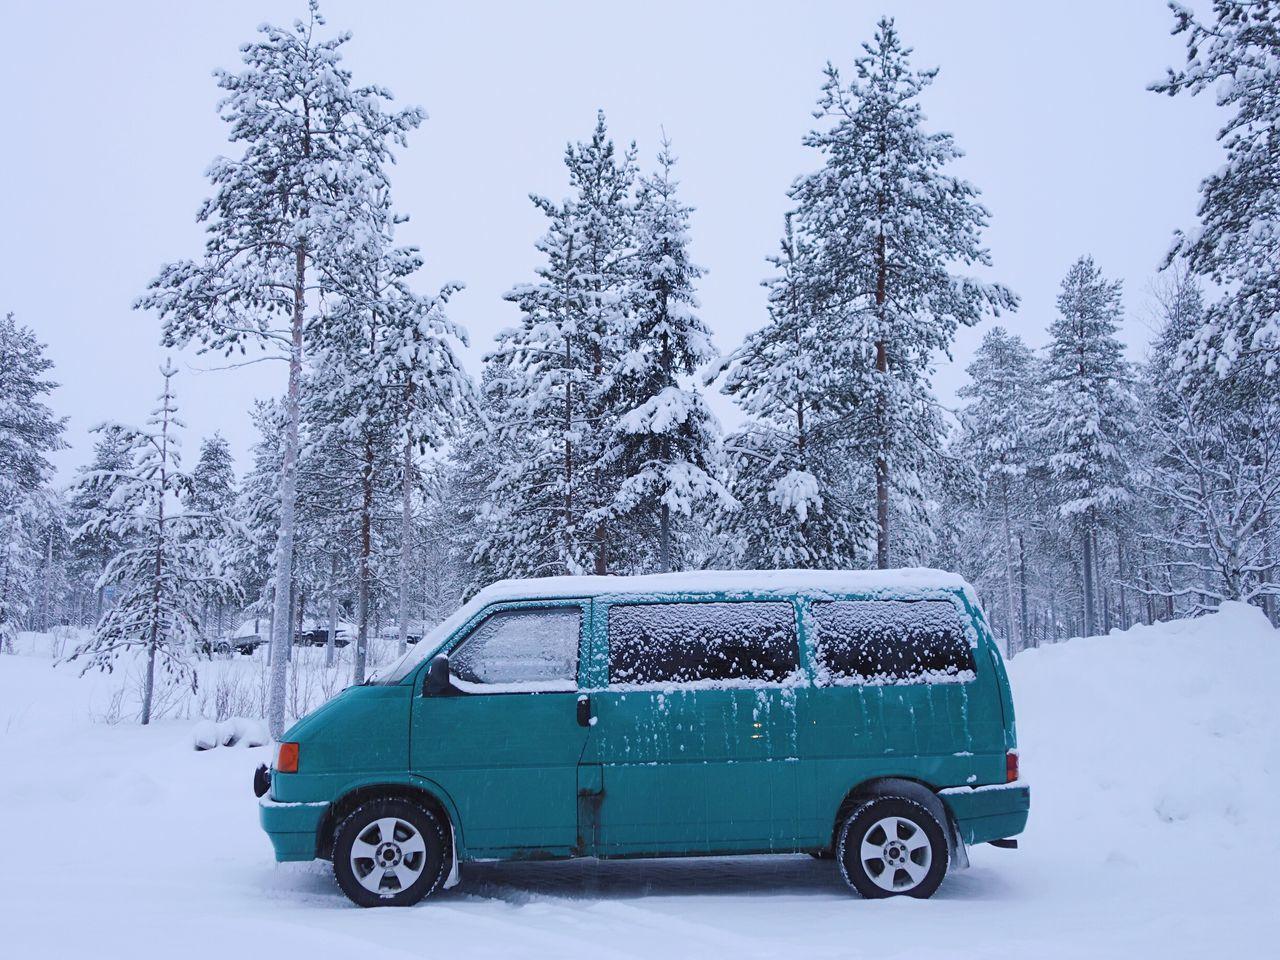 Beautiful stock photos of weihnachtsmann, tree, mode of transport, land vehicle, transportation